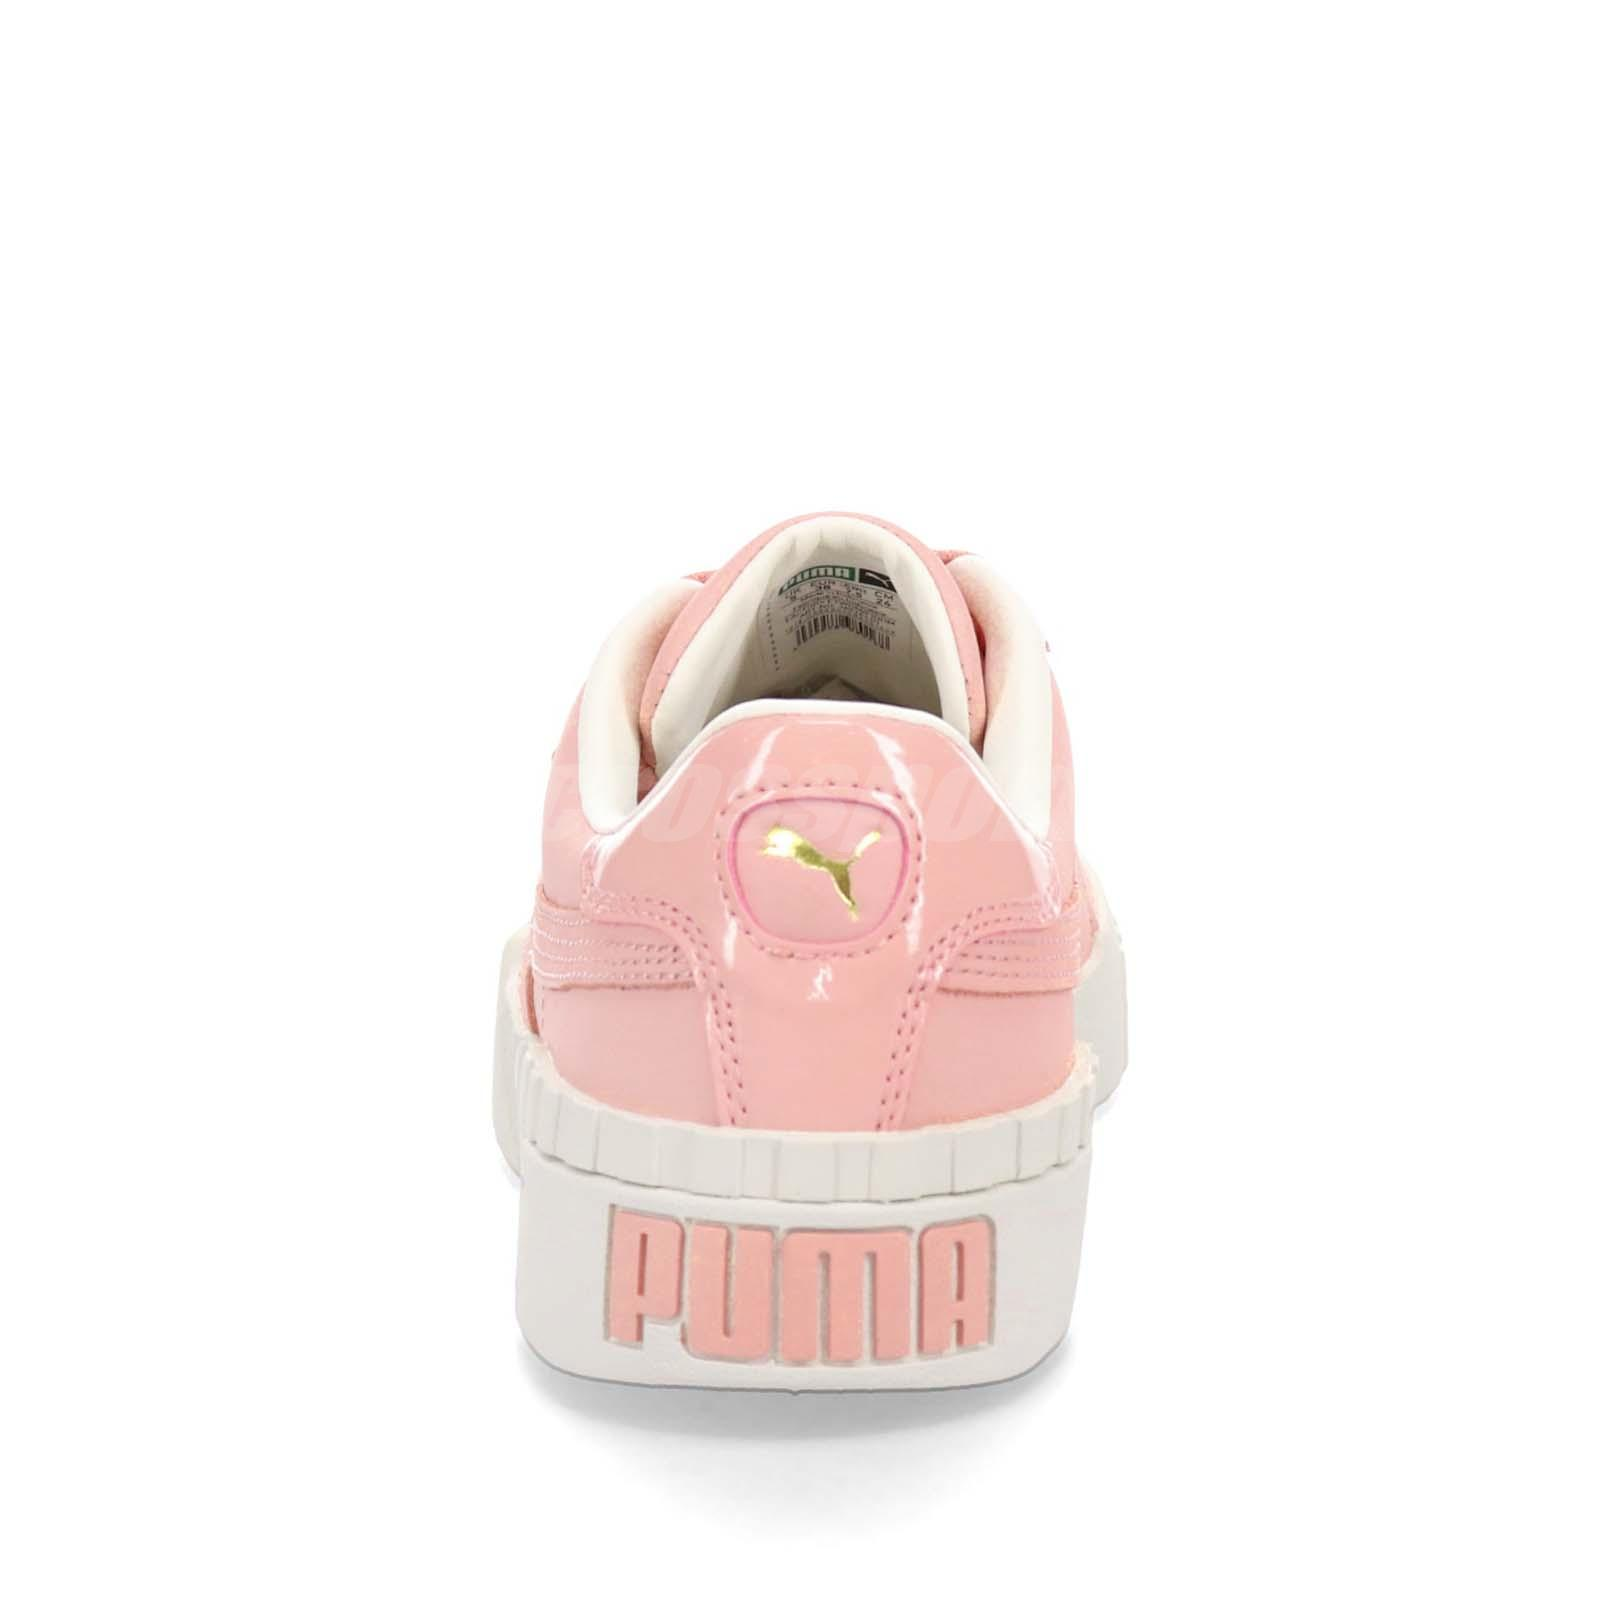 1857bb67d37cac Puma Cali Nubuck Wns Peach Bud Pink Women Casual Shoes Sneakers ...